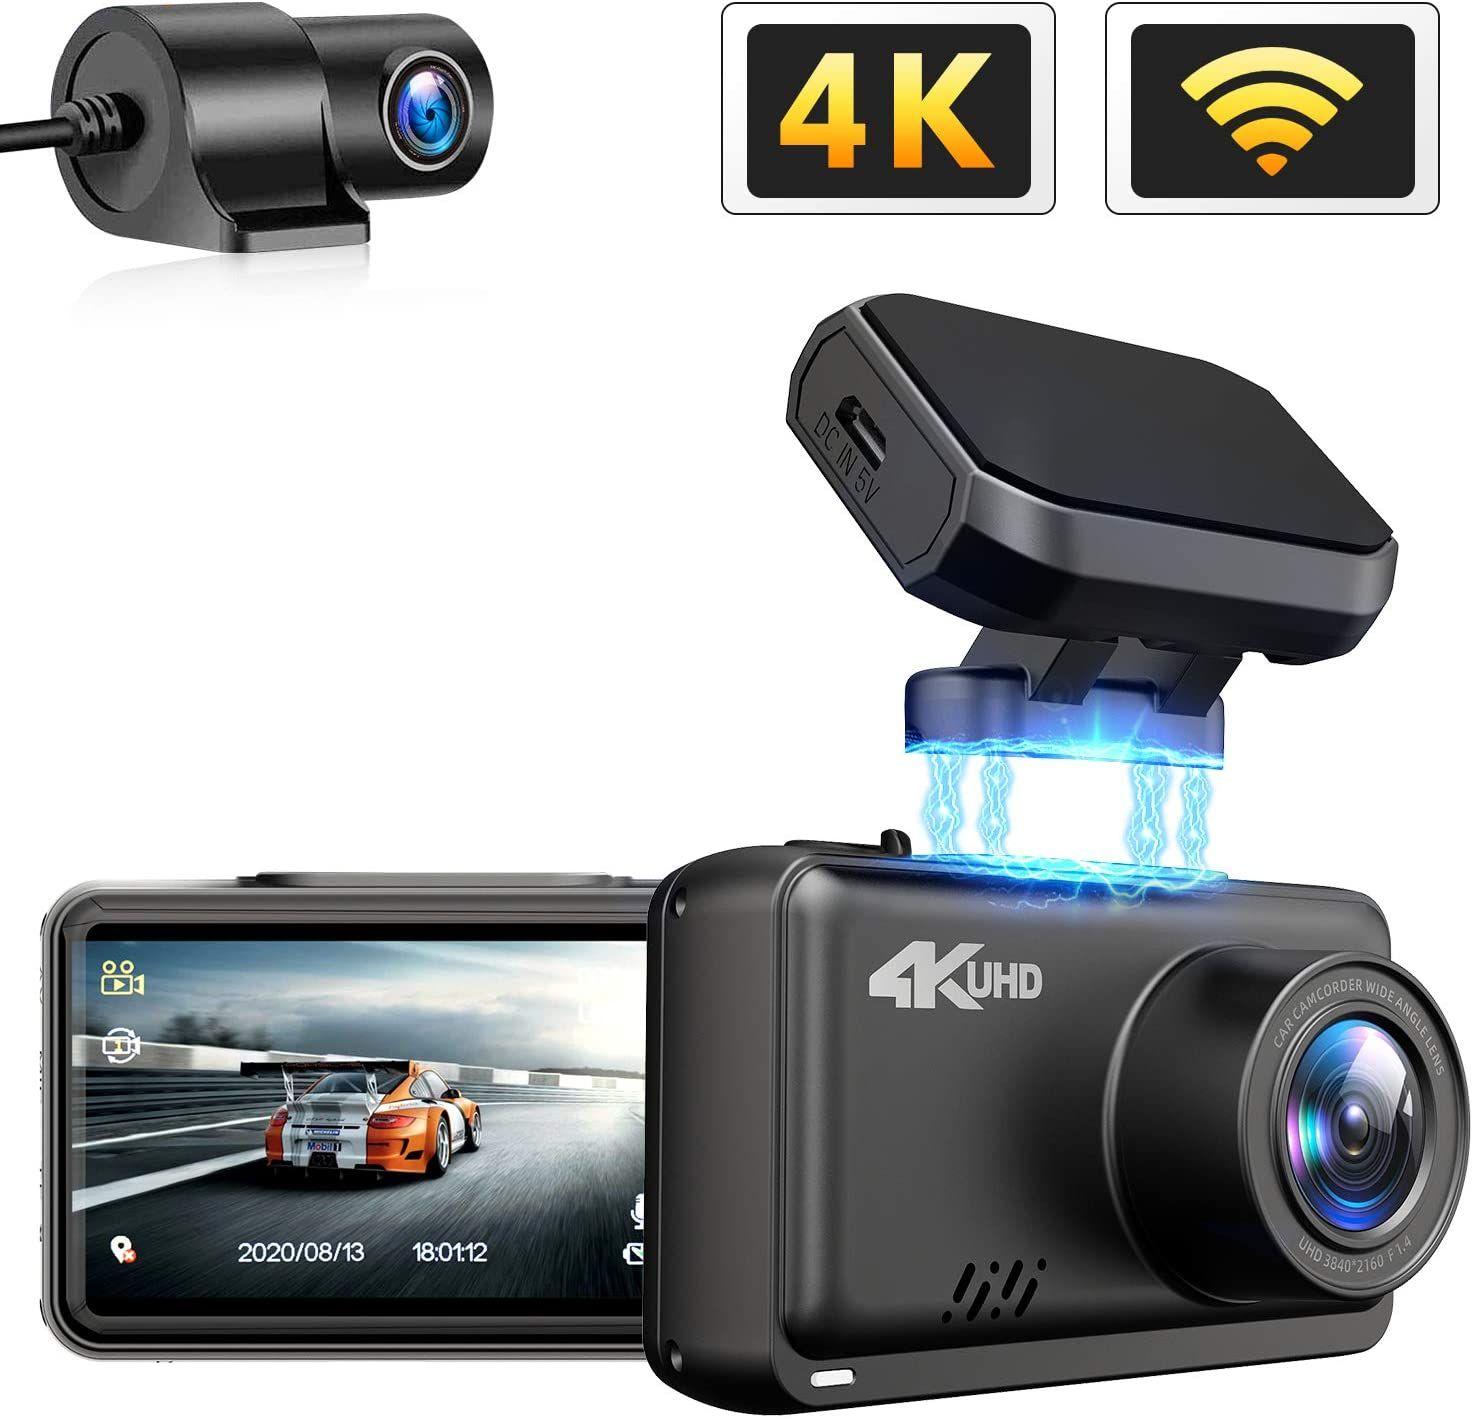 Jomise Dual Dash Cam 4k 1080p Built In Wifi Gps Car Dashboard Camera Recorder With Uhd 3840x2160p Dashcam Dash Camera Gps